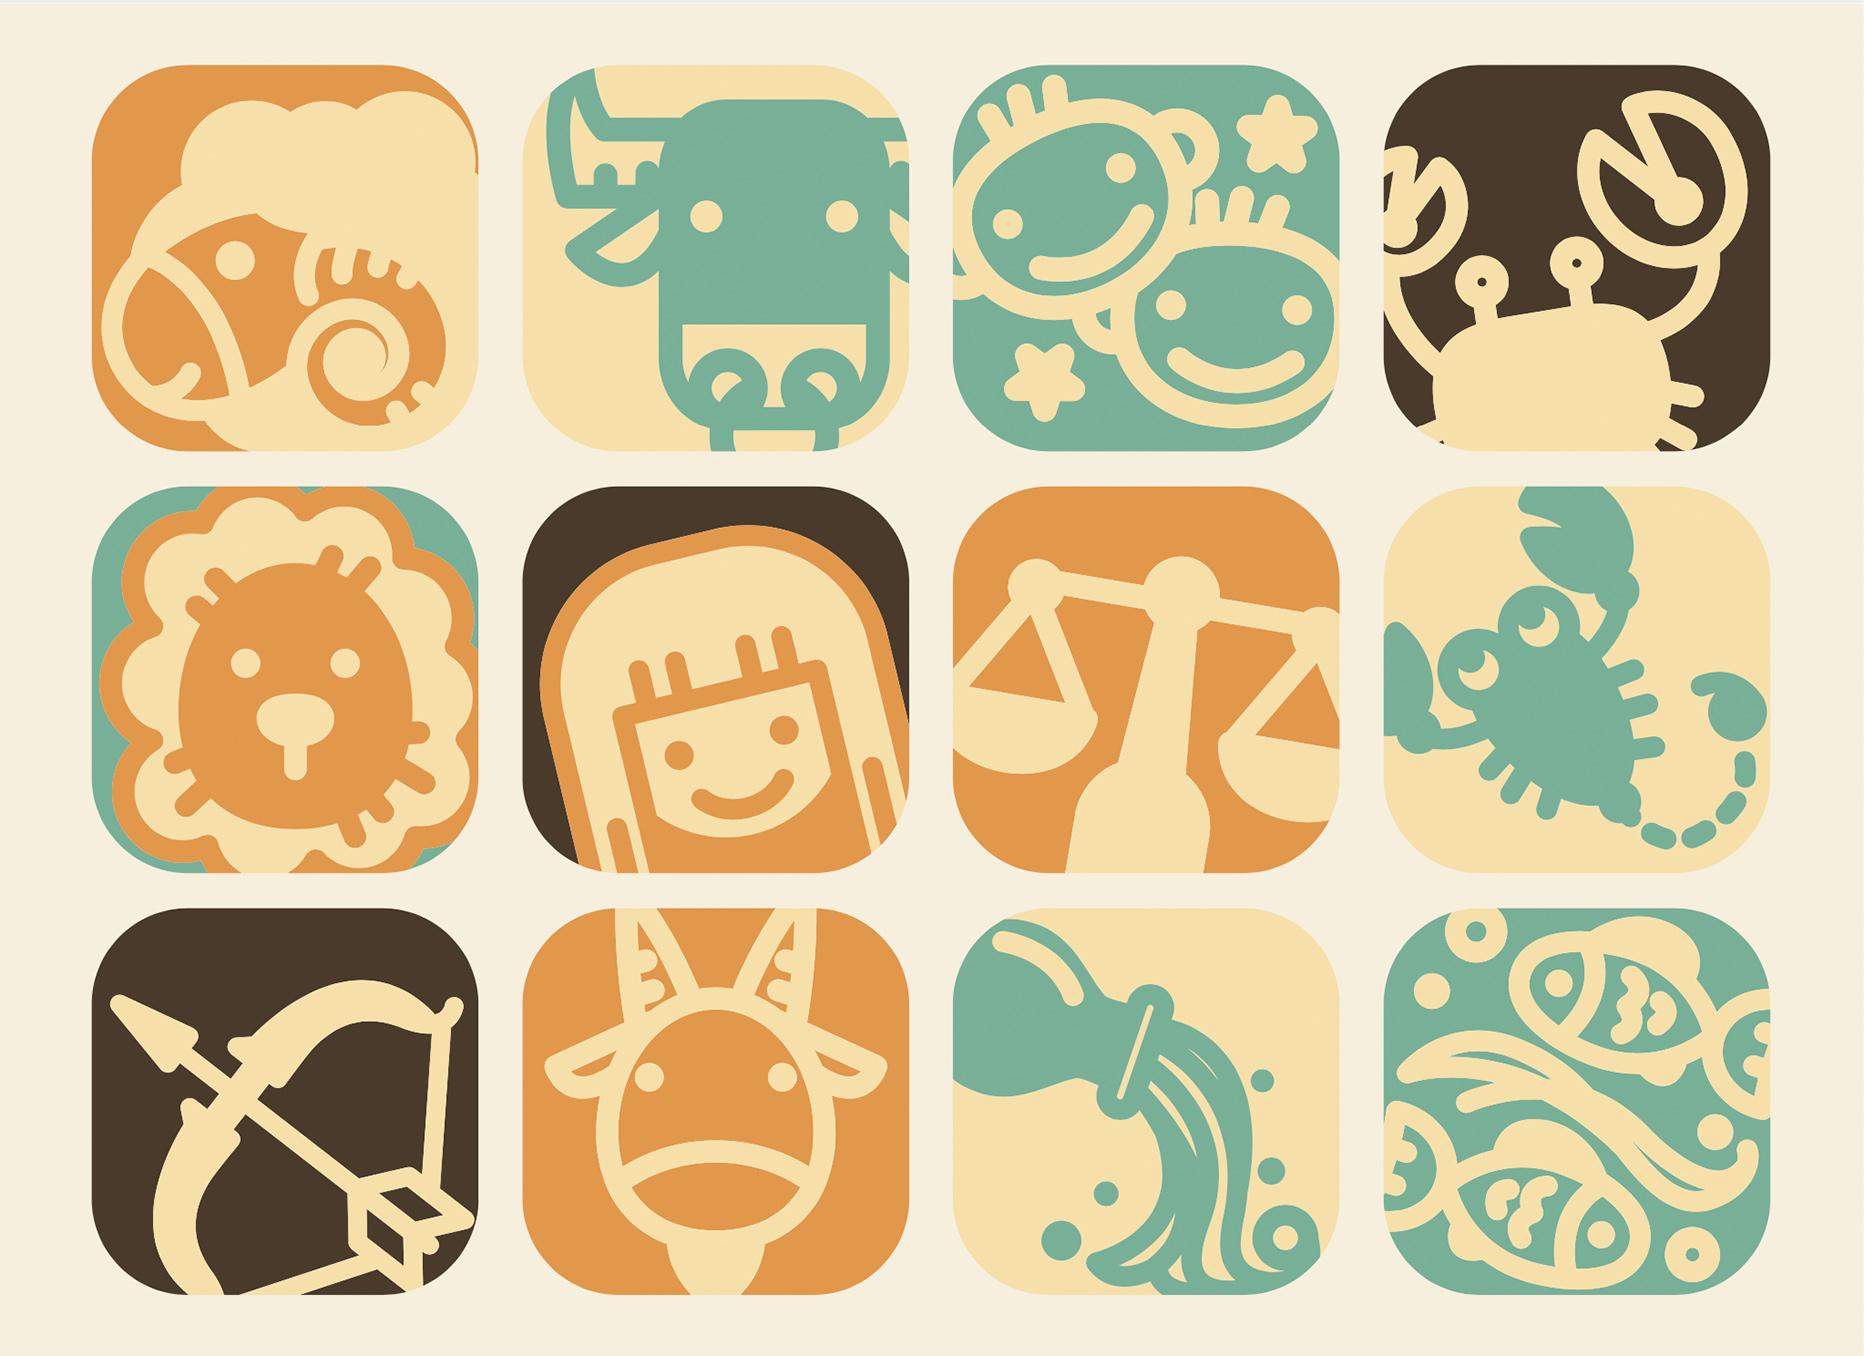 Astrology sign